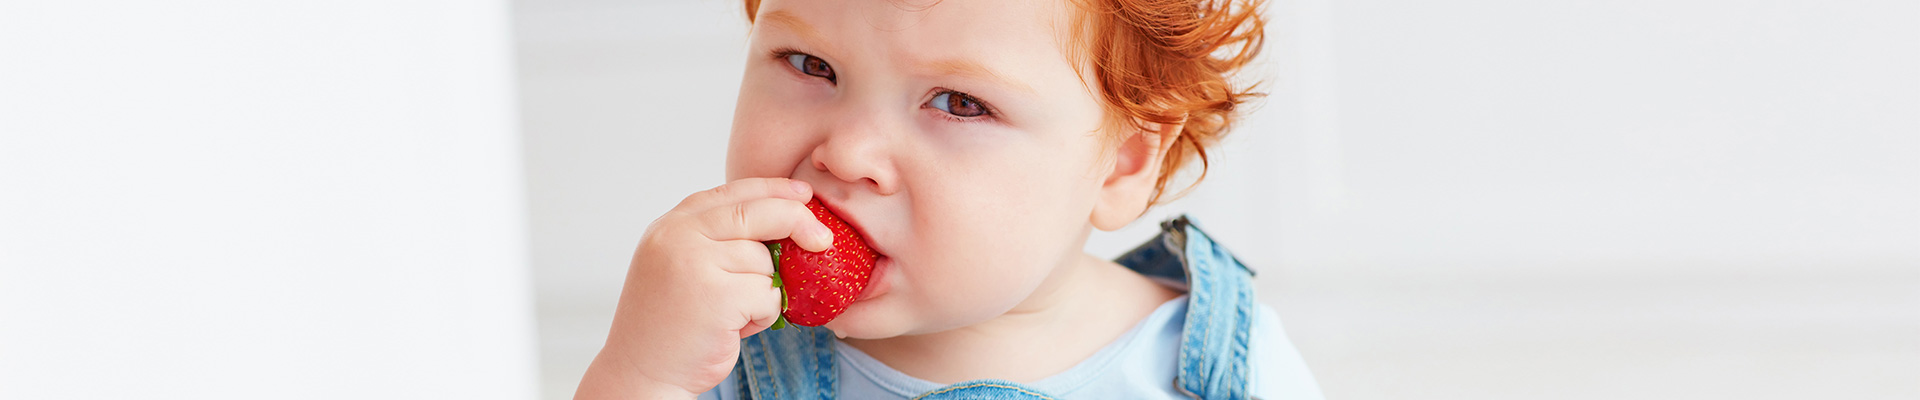 Development milestones associated to food intake